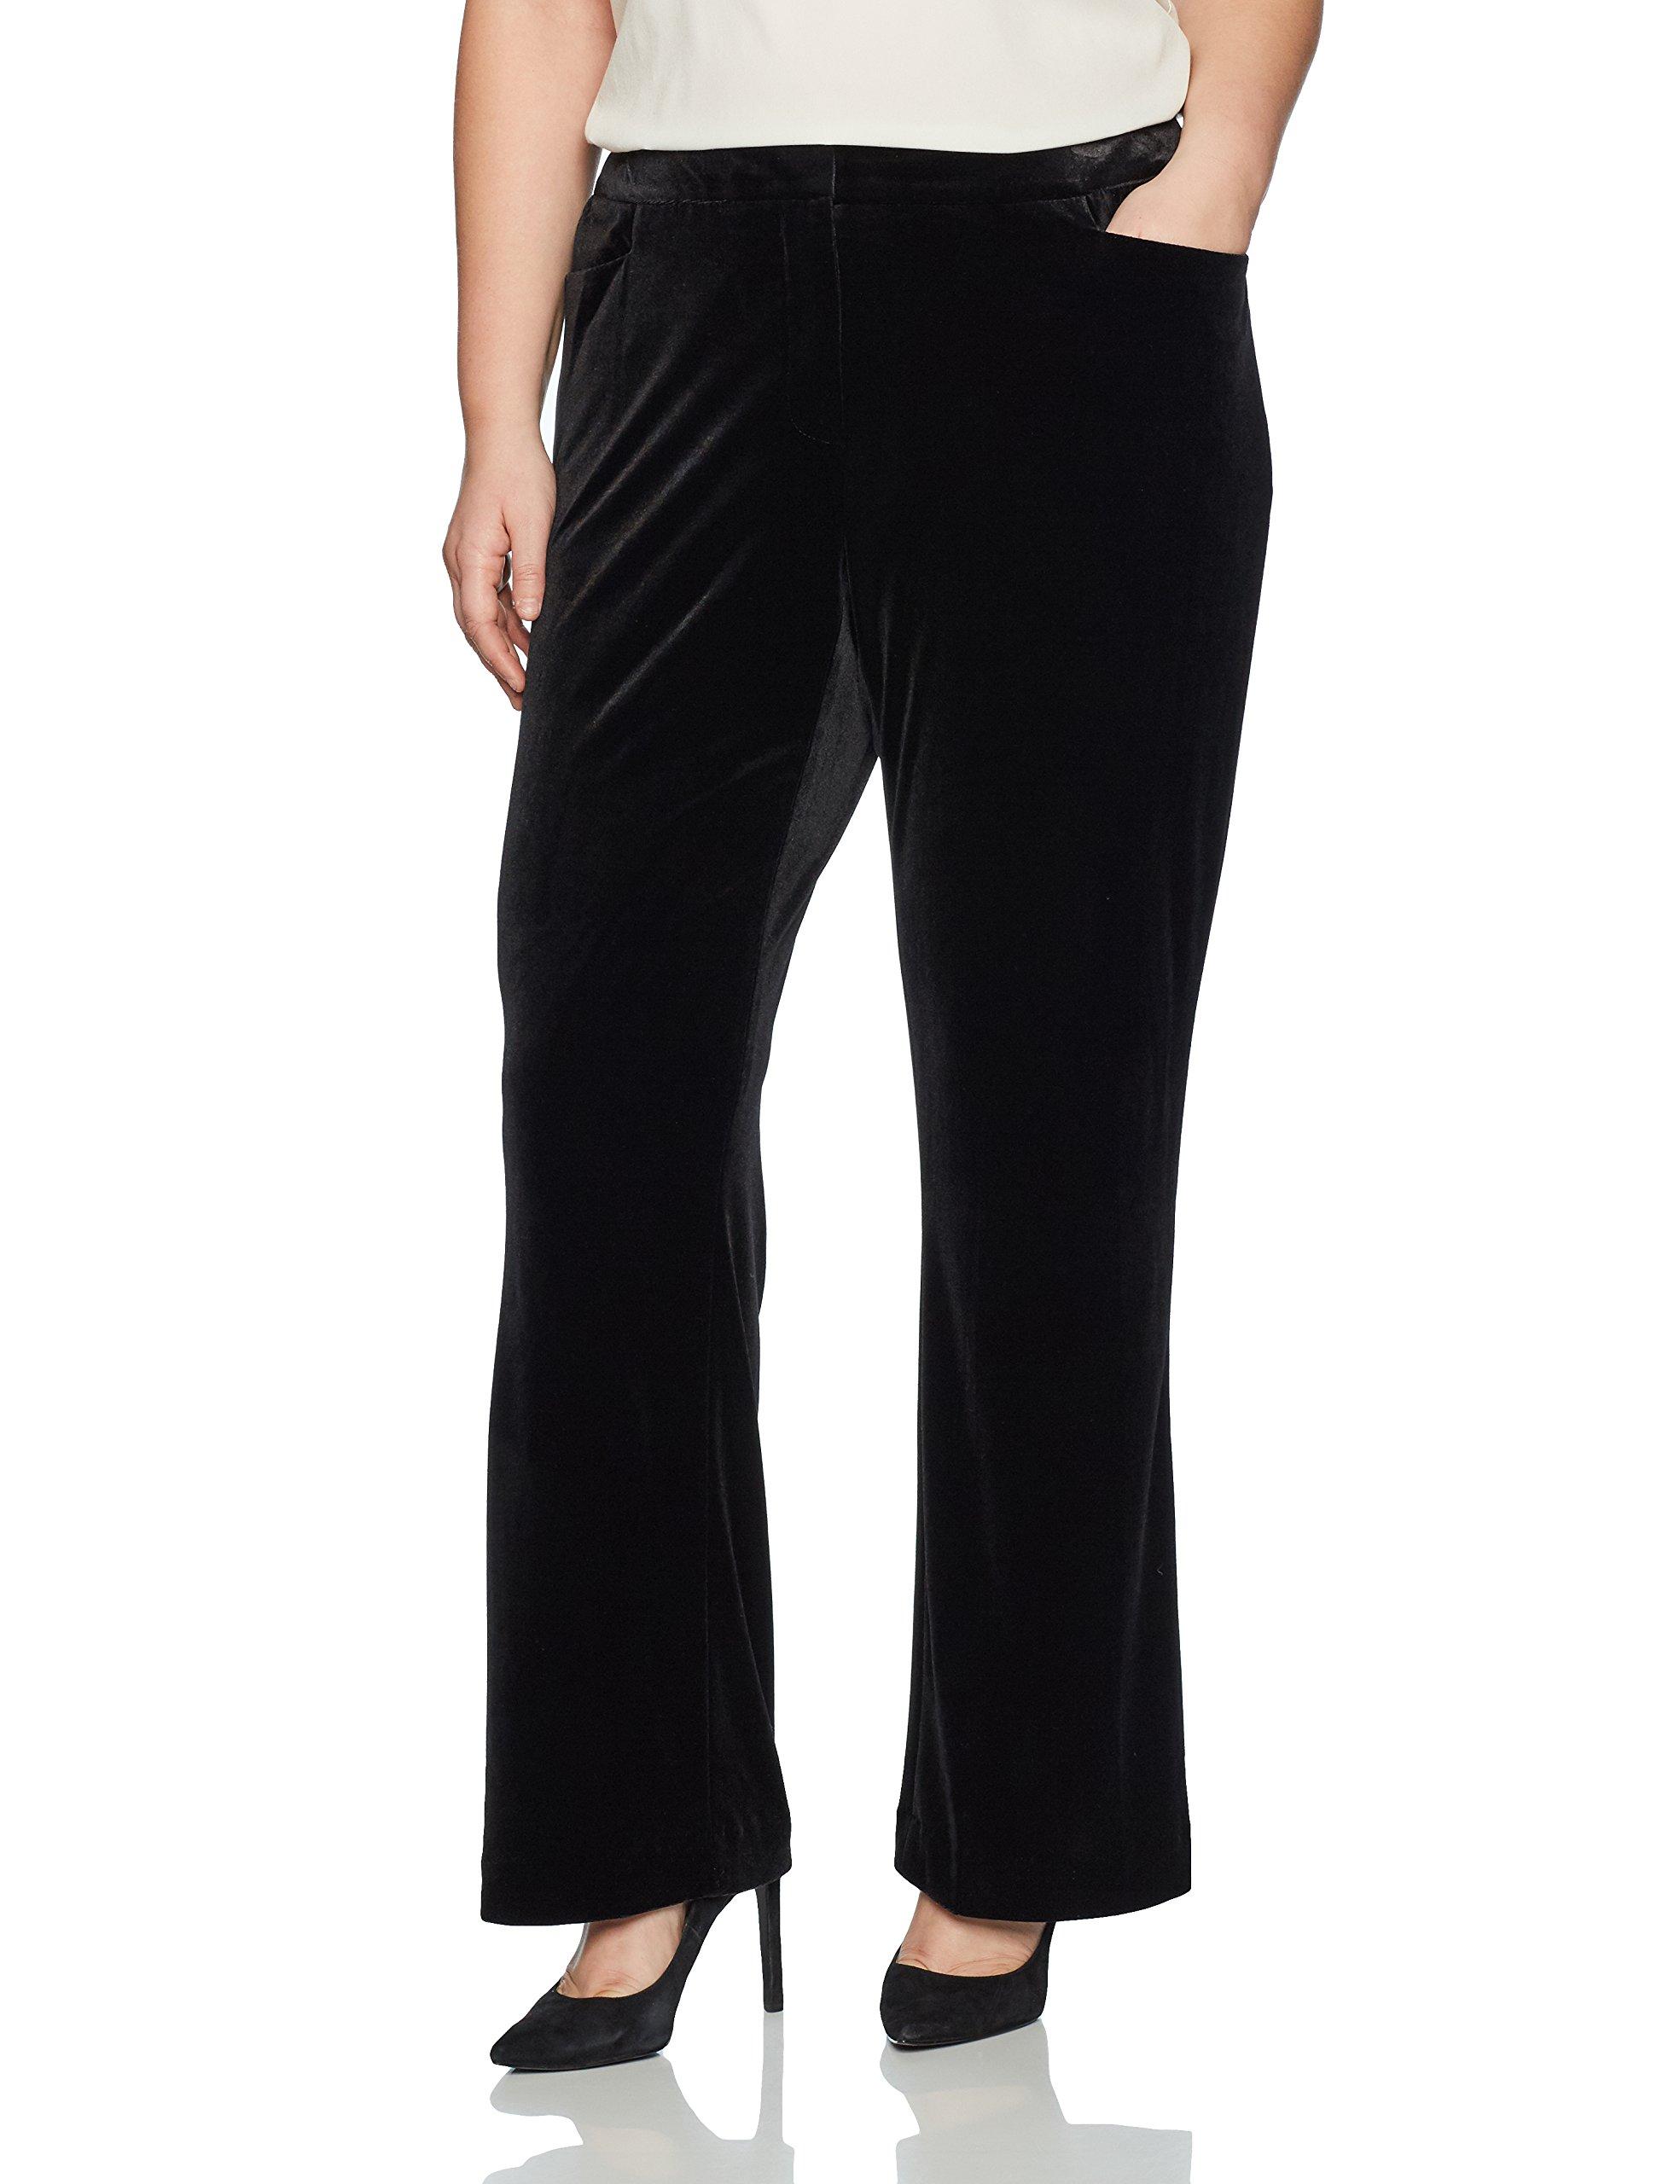 Calvin Klein Women's Plus Size Velvet Pant, Black, 20W